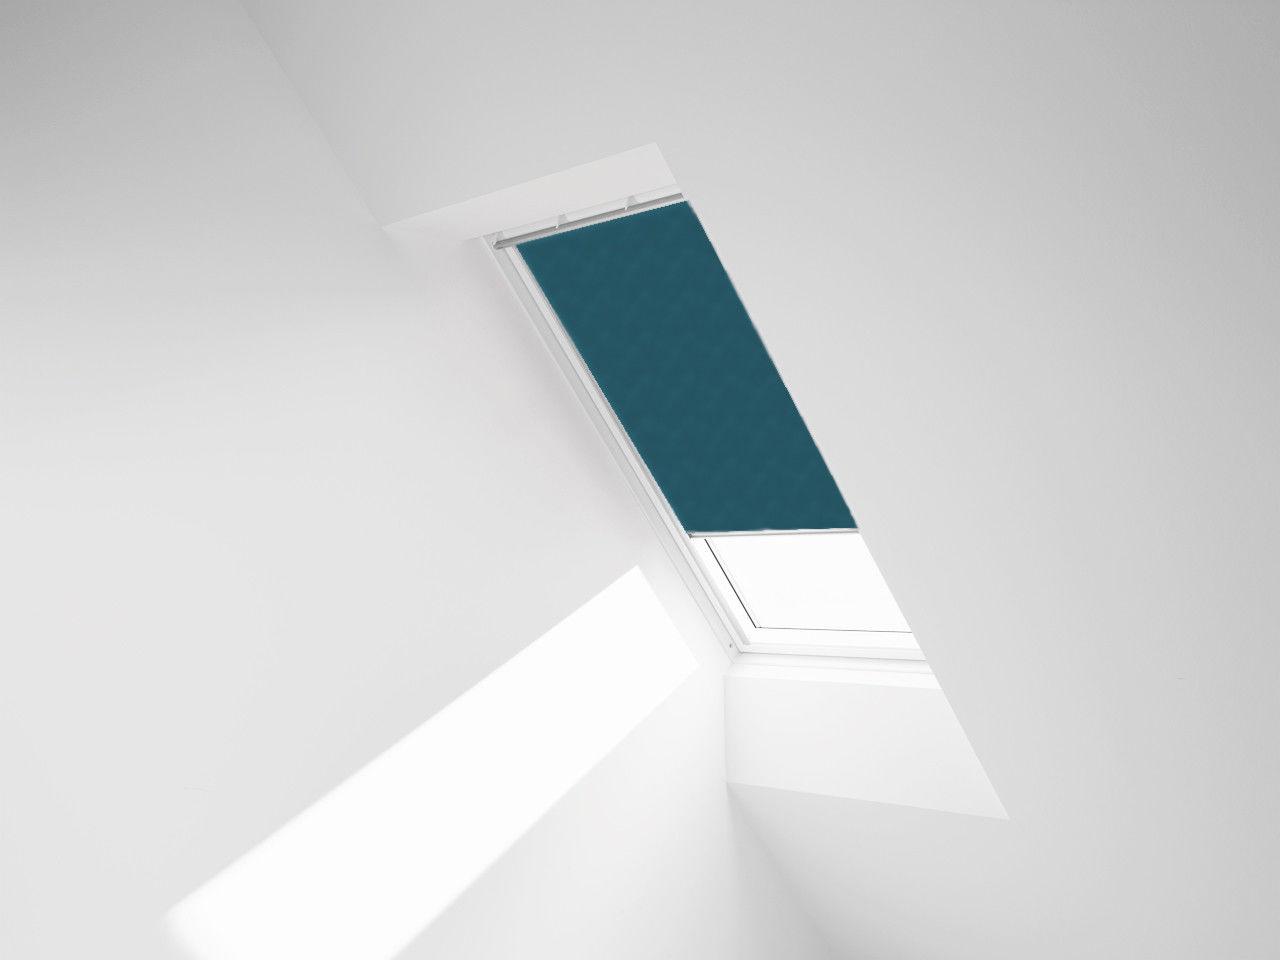 ROLETA ZACIEMNIAJĄCA ROOFART DUR - kolor 4232 (turkusowy) - 55x78 C2A